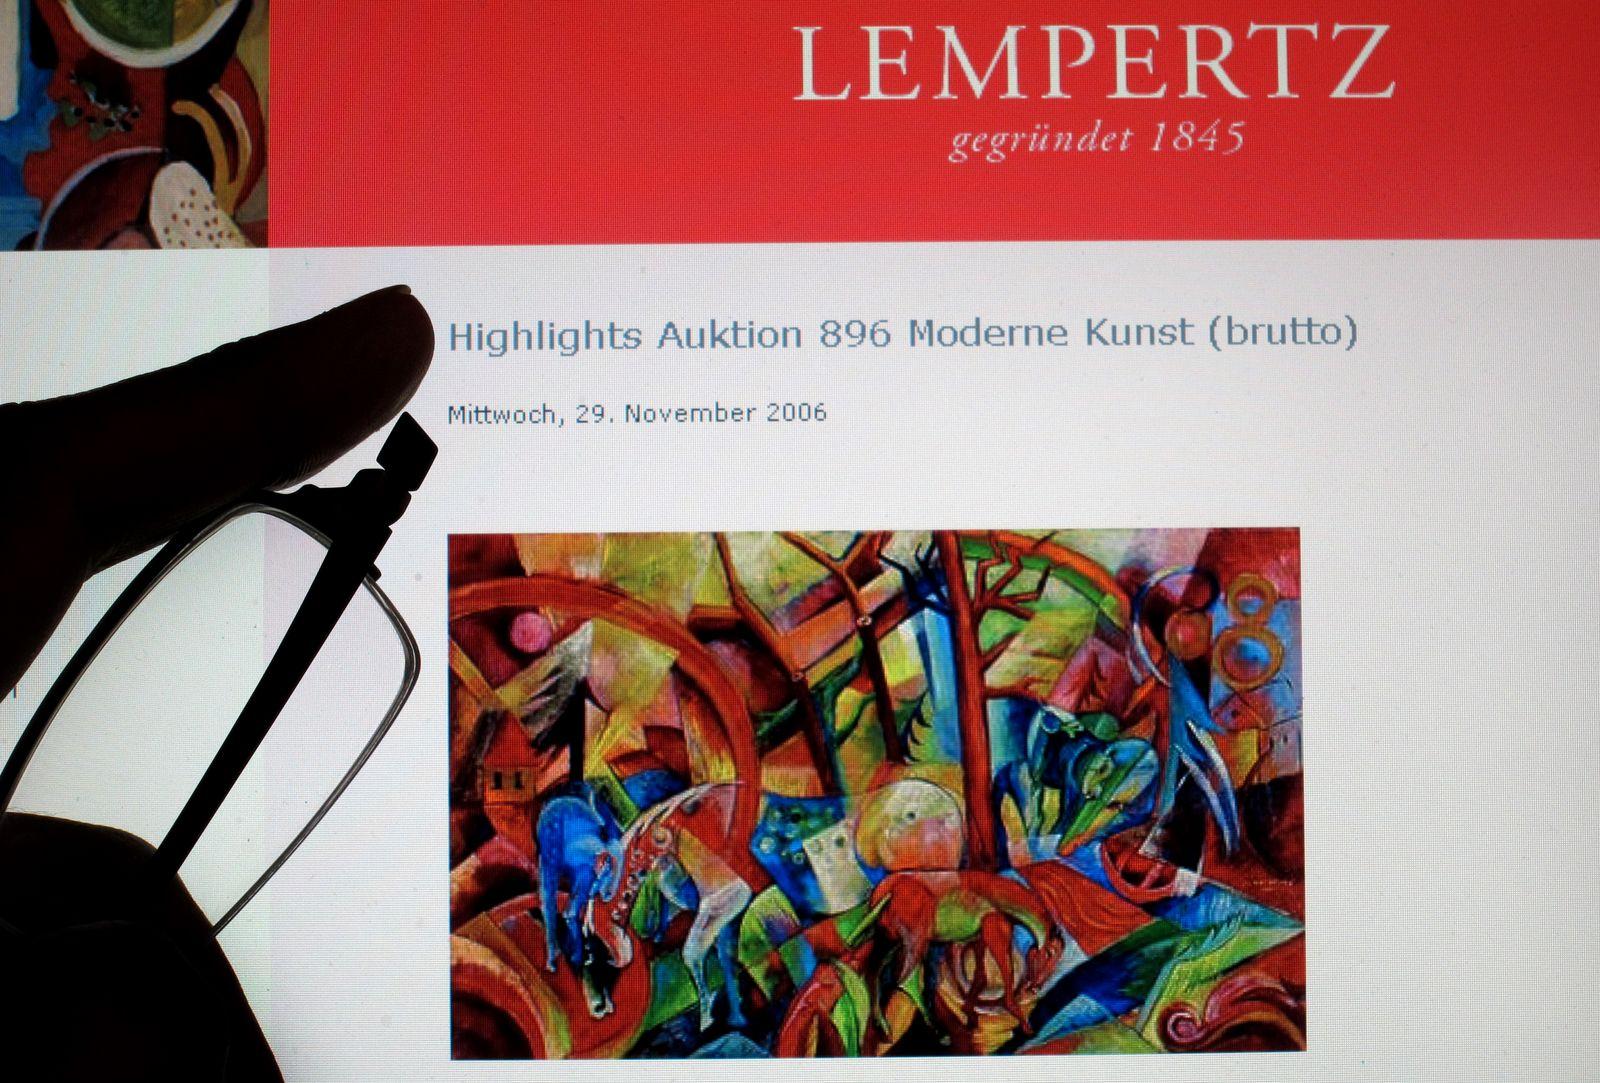 Lempertz/ Jäger/ Campendonk/ Kunstfälschung